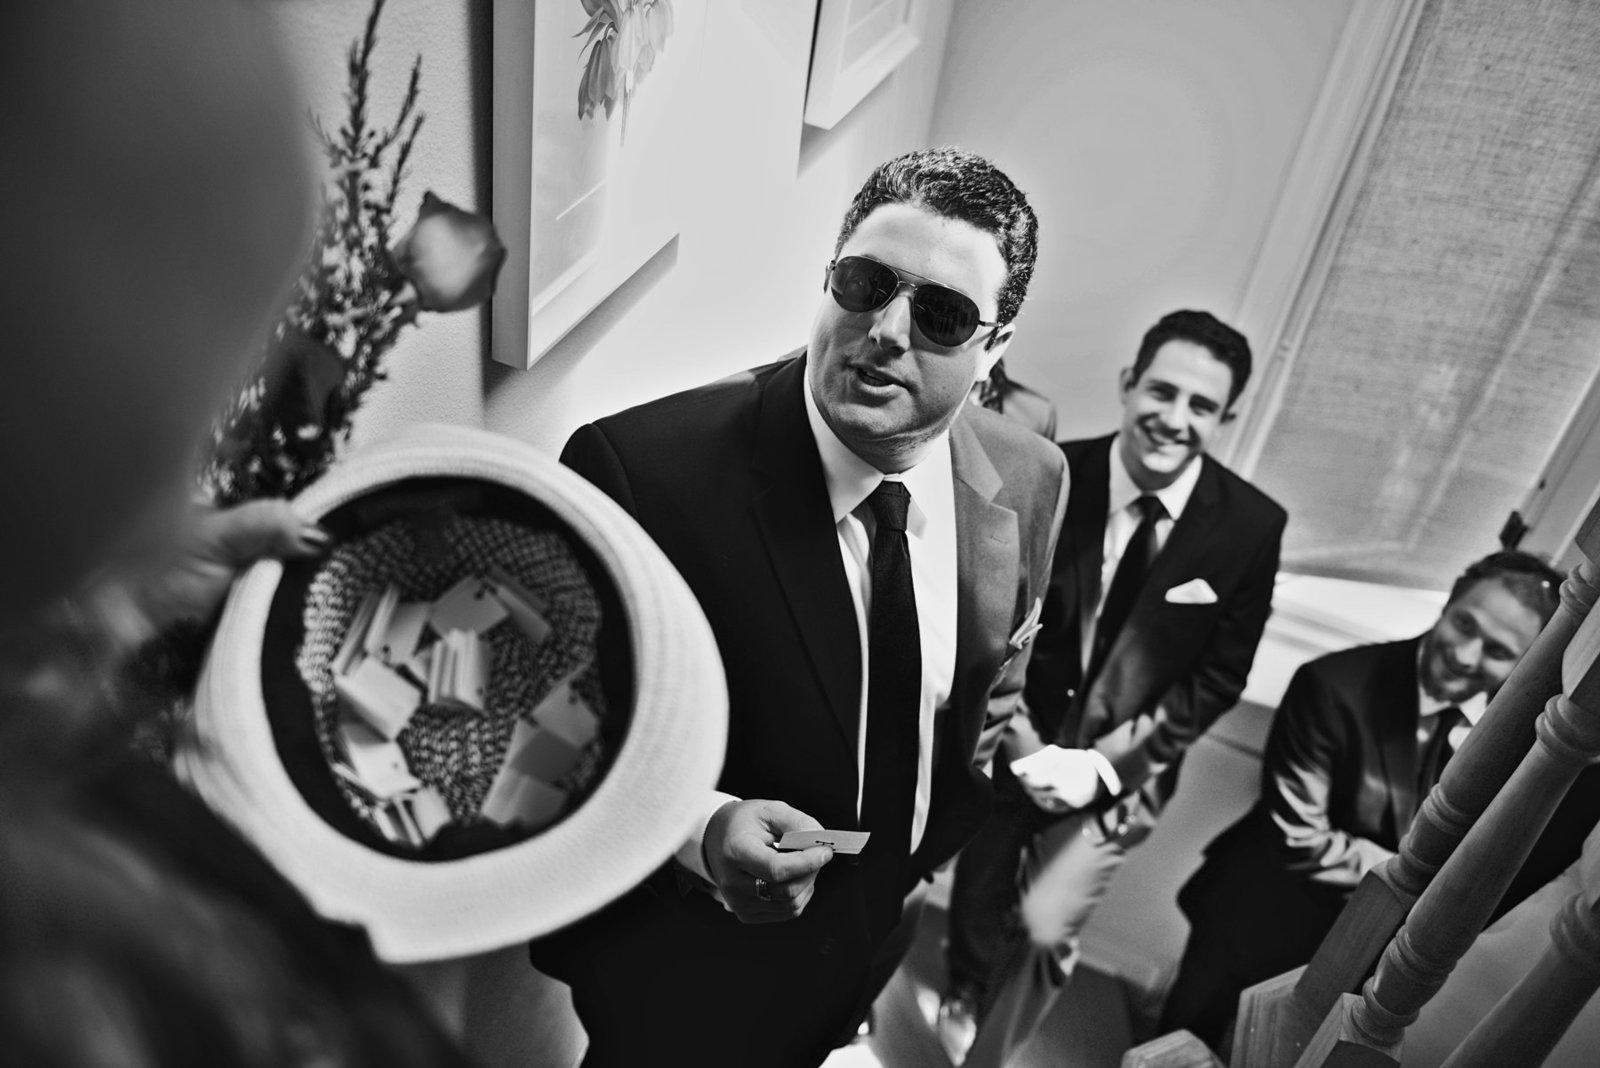 malibu wedding photographer photos celebrity wedding photographer bryan newfield photography ruth mike 07